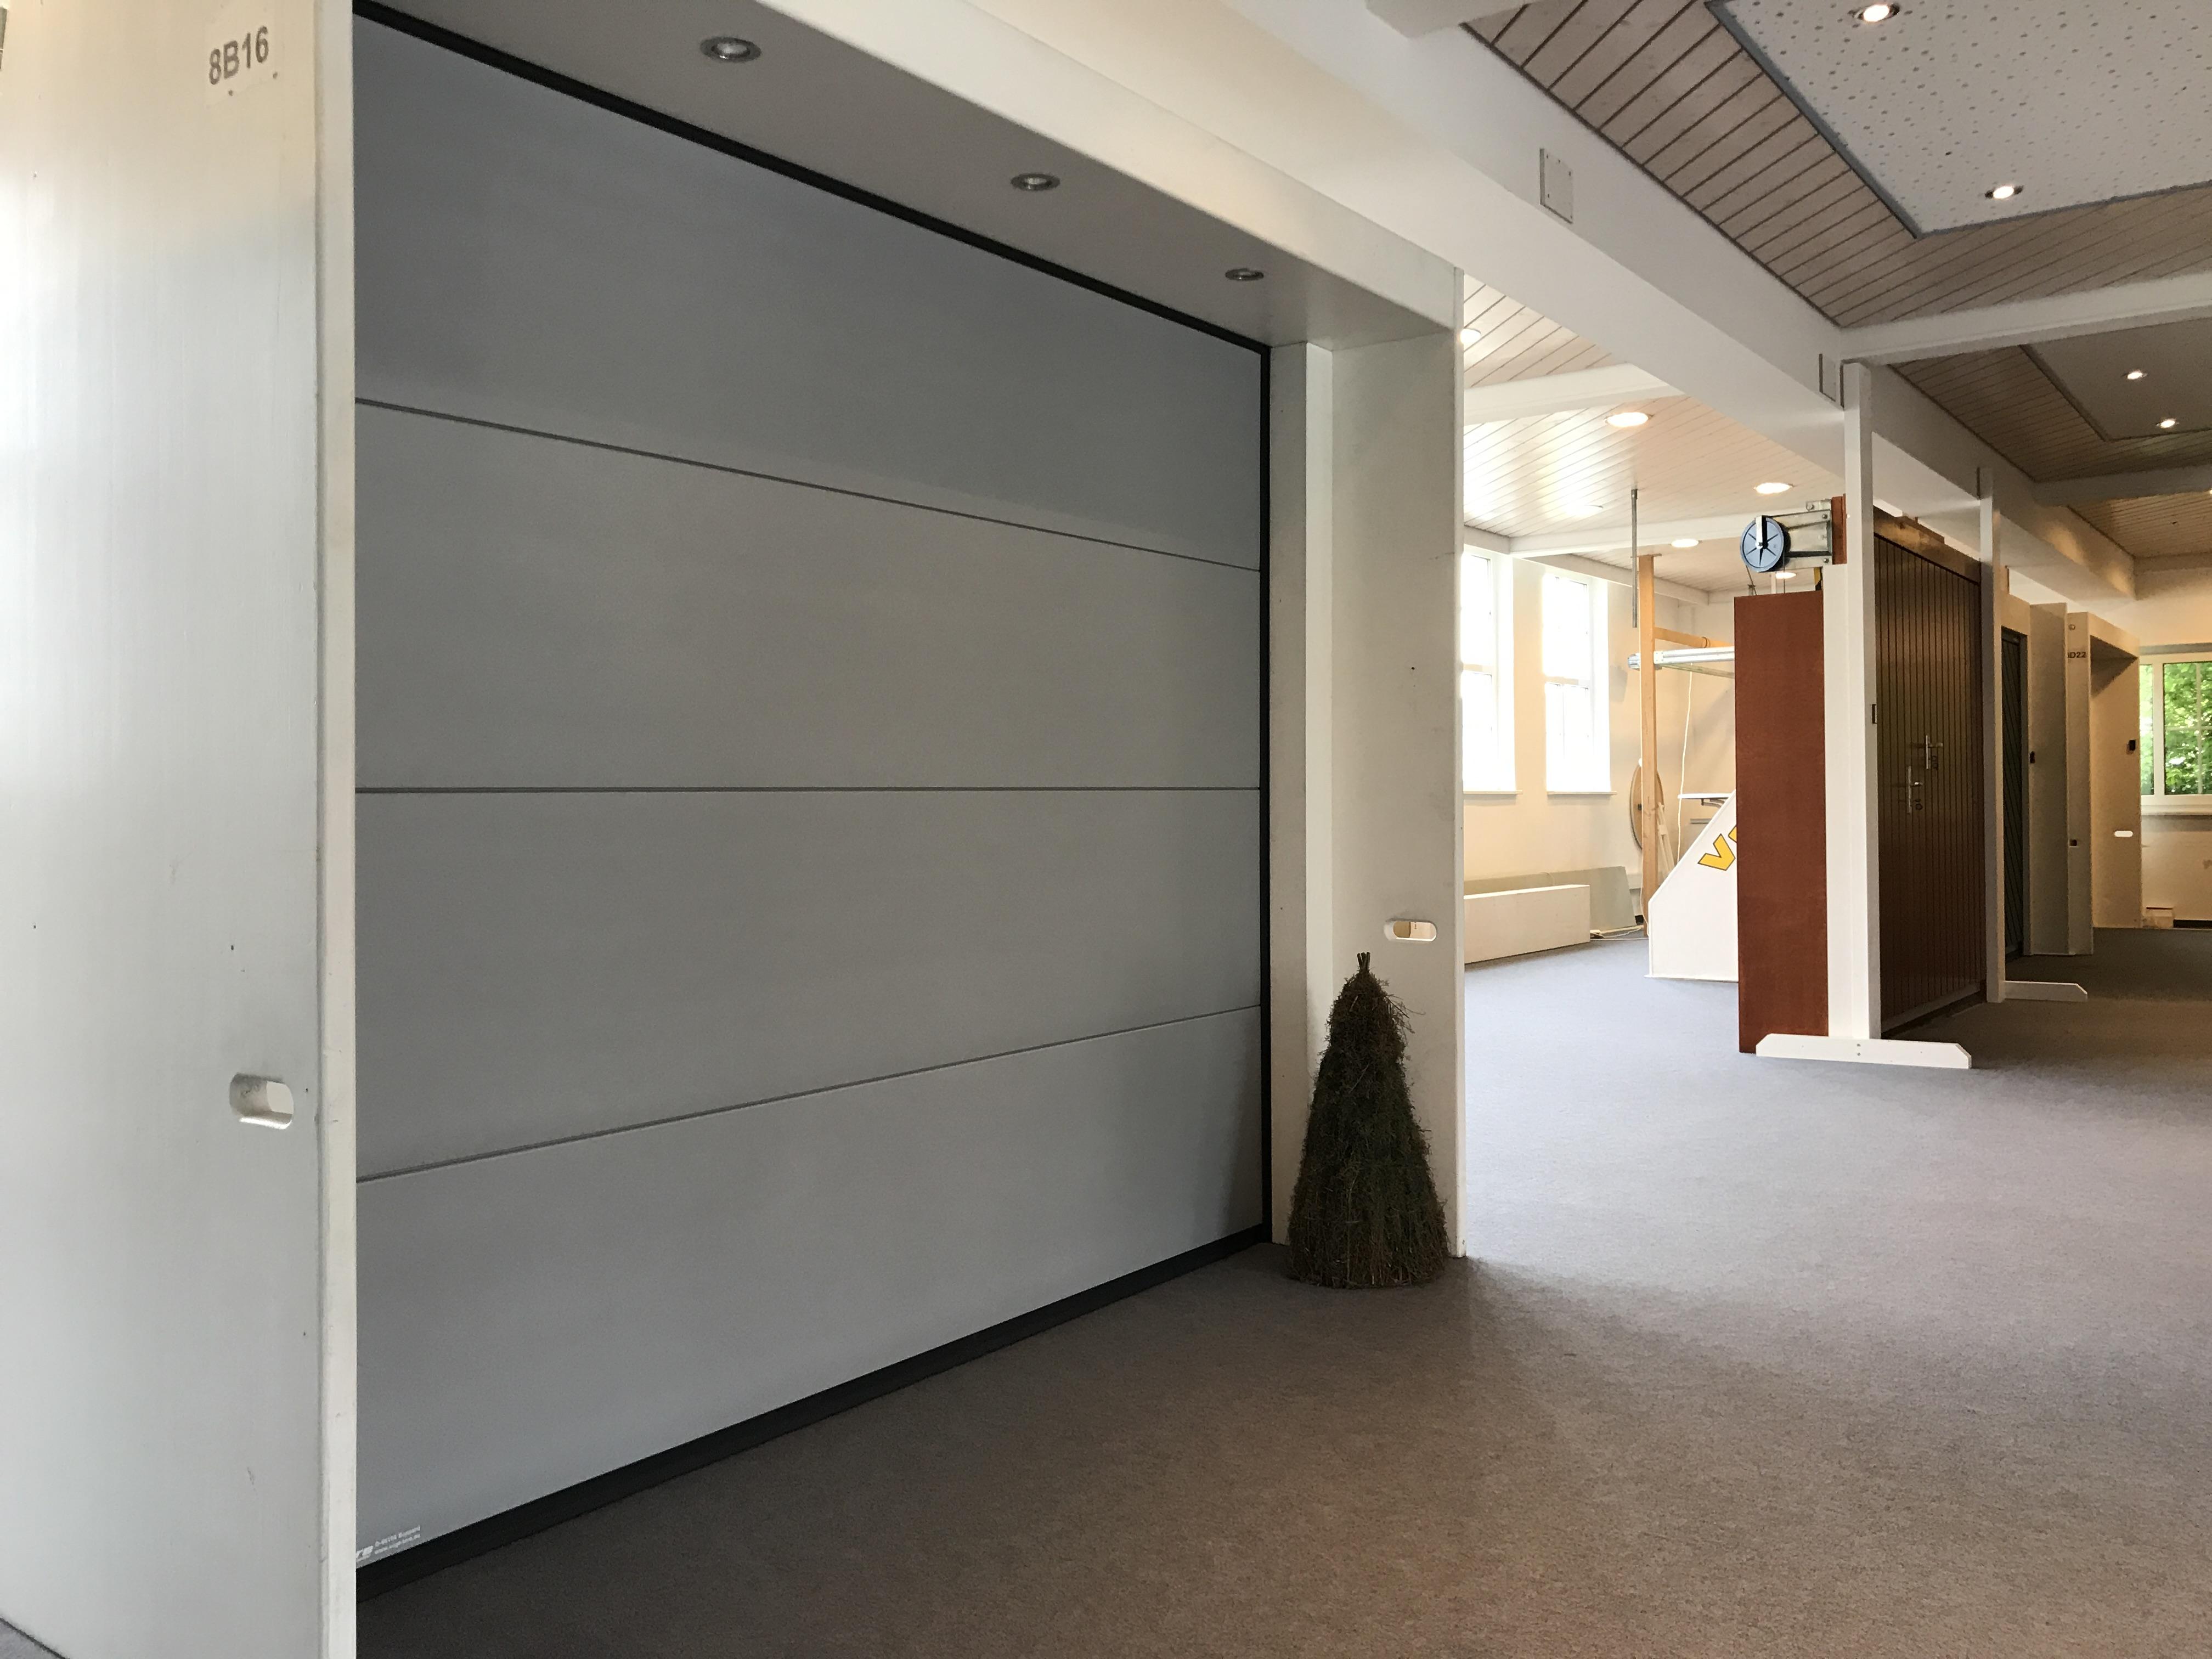 ausstellung vogt tore holzbau gmbh. Black Bedroom Furniture Sets. Home Design Ideas